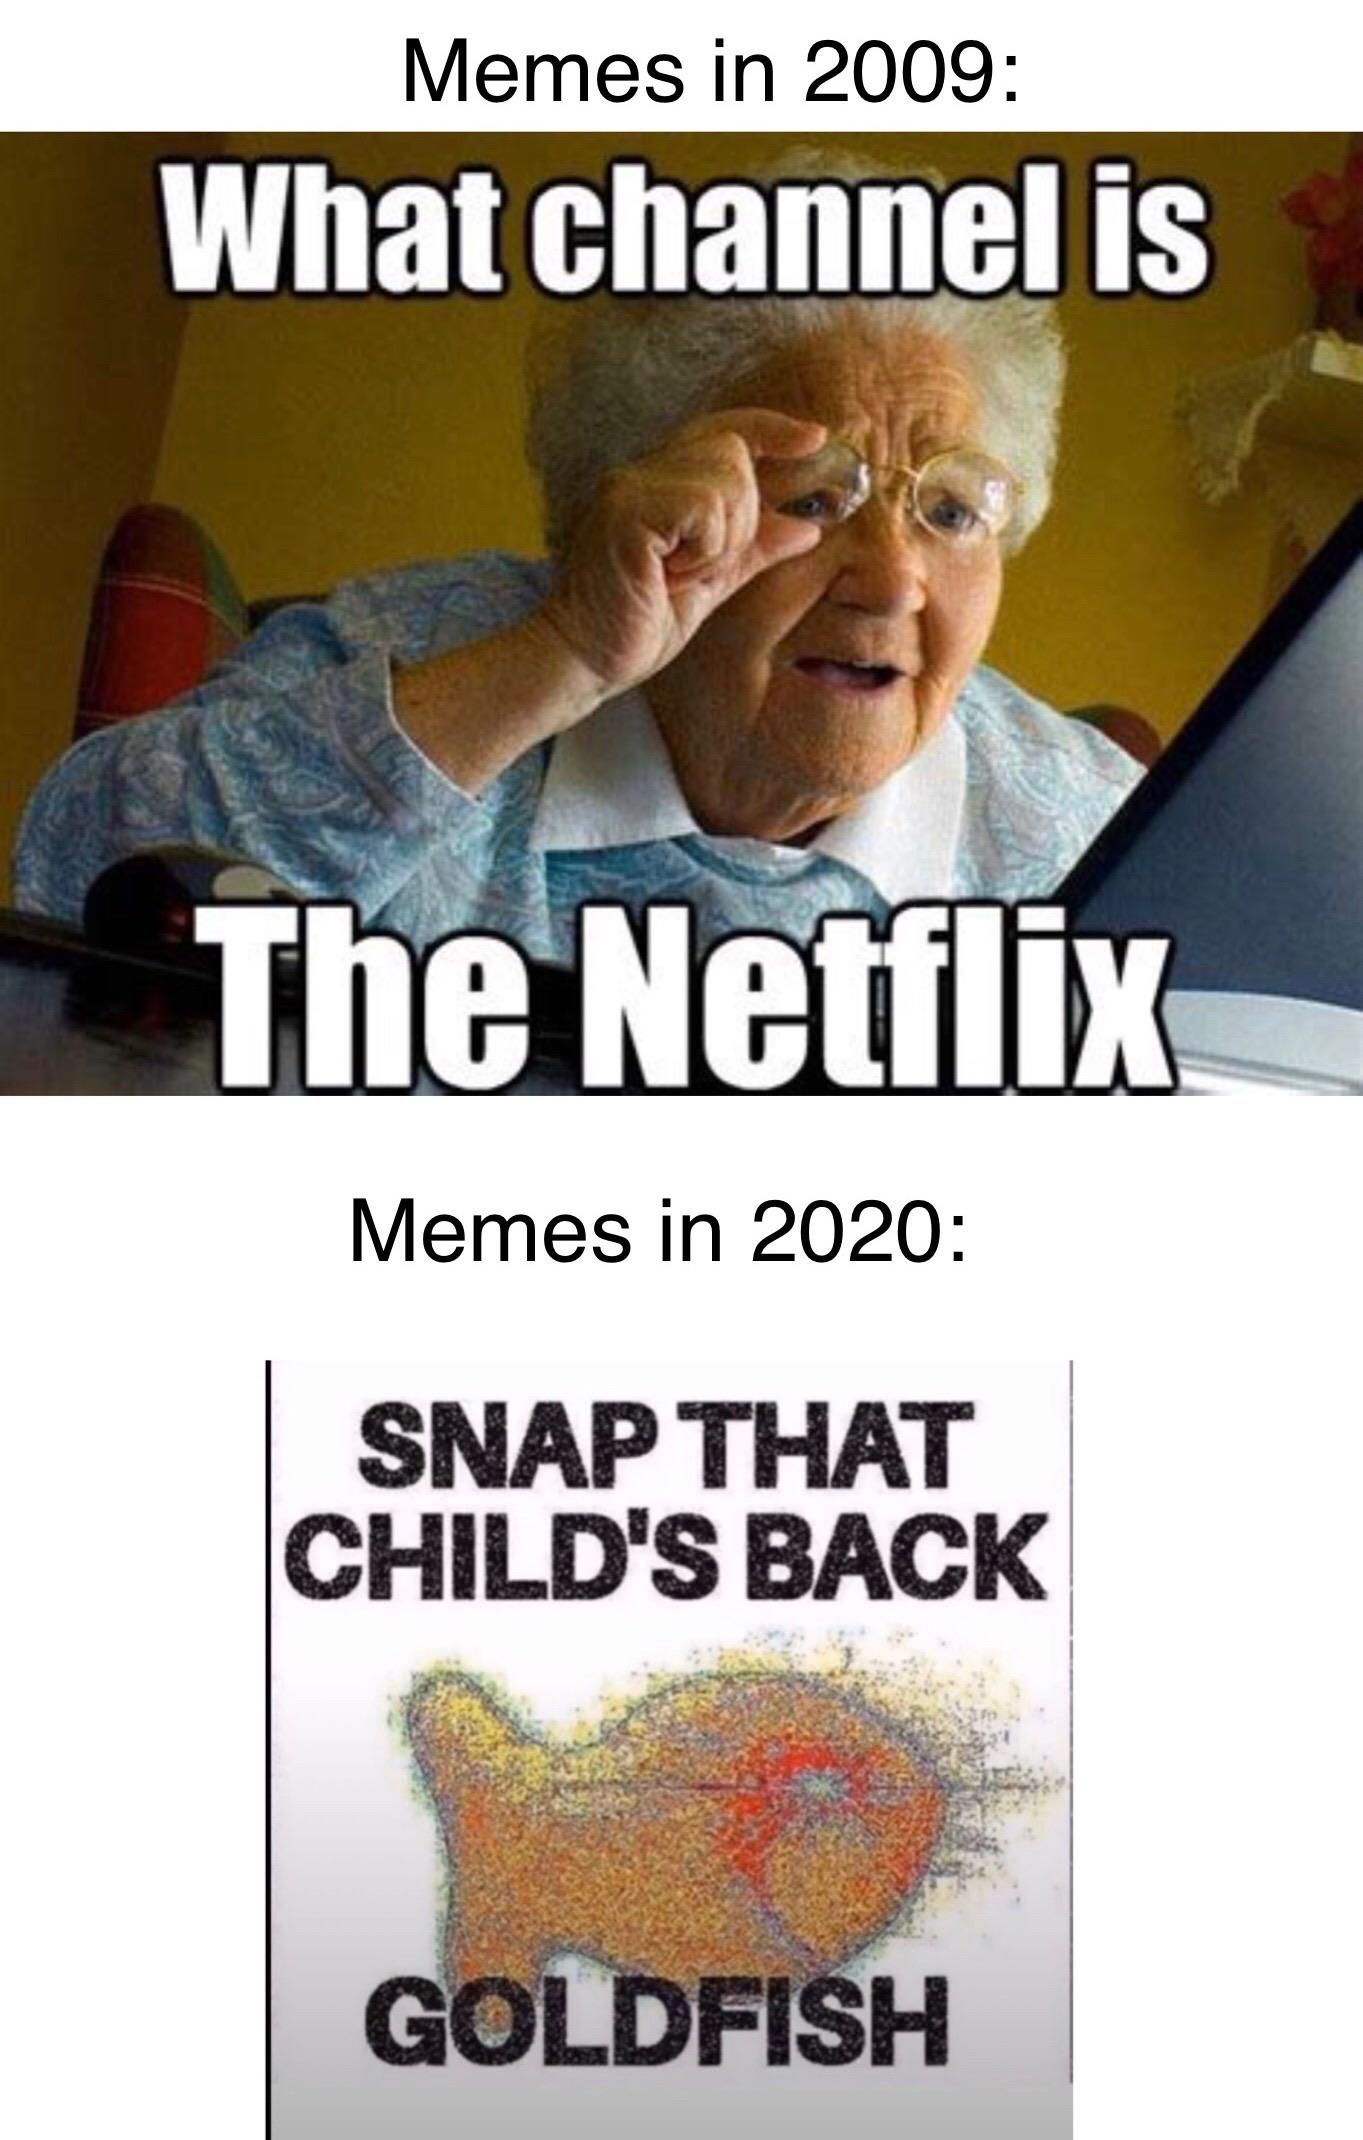 A Meme My Friend Made Memes Memesociety Funny Really Funny Memes Funny Boyfriend Memes Crazy Funny Memes